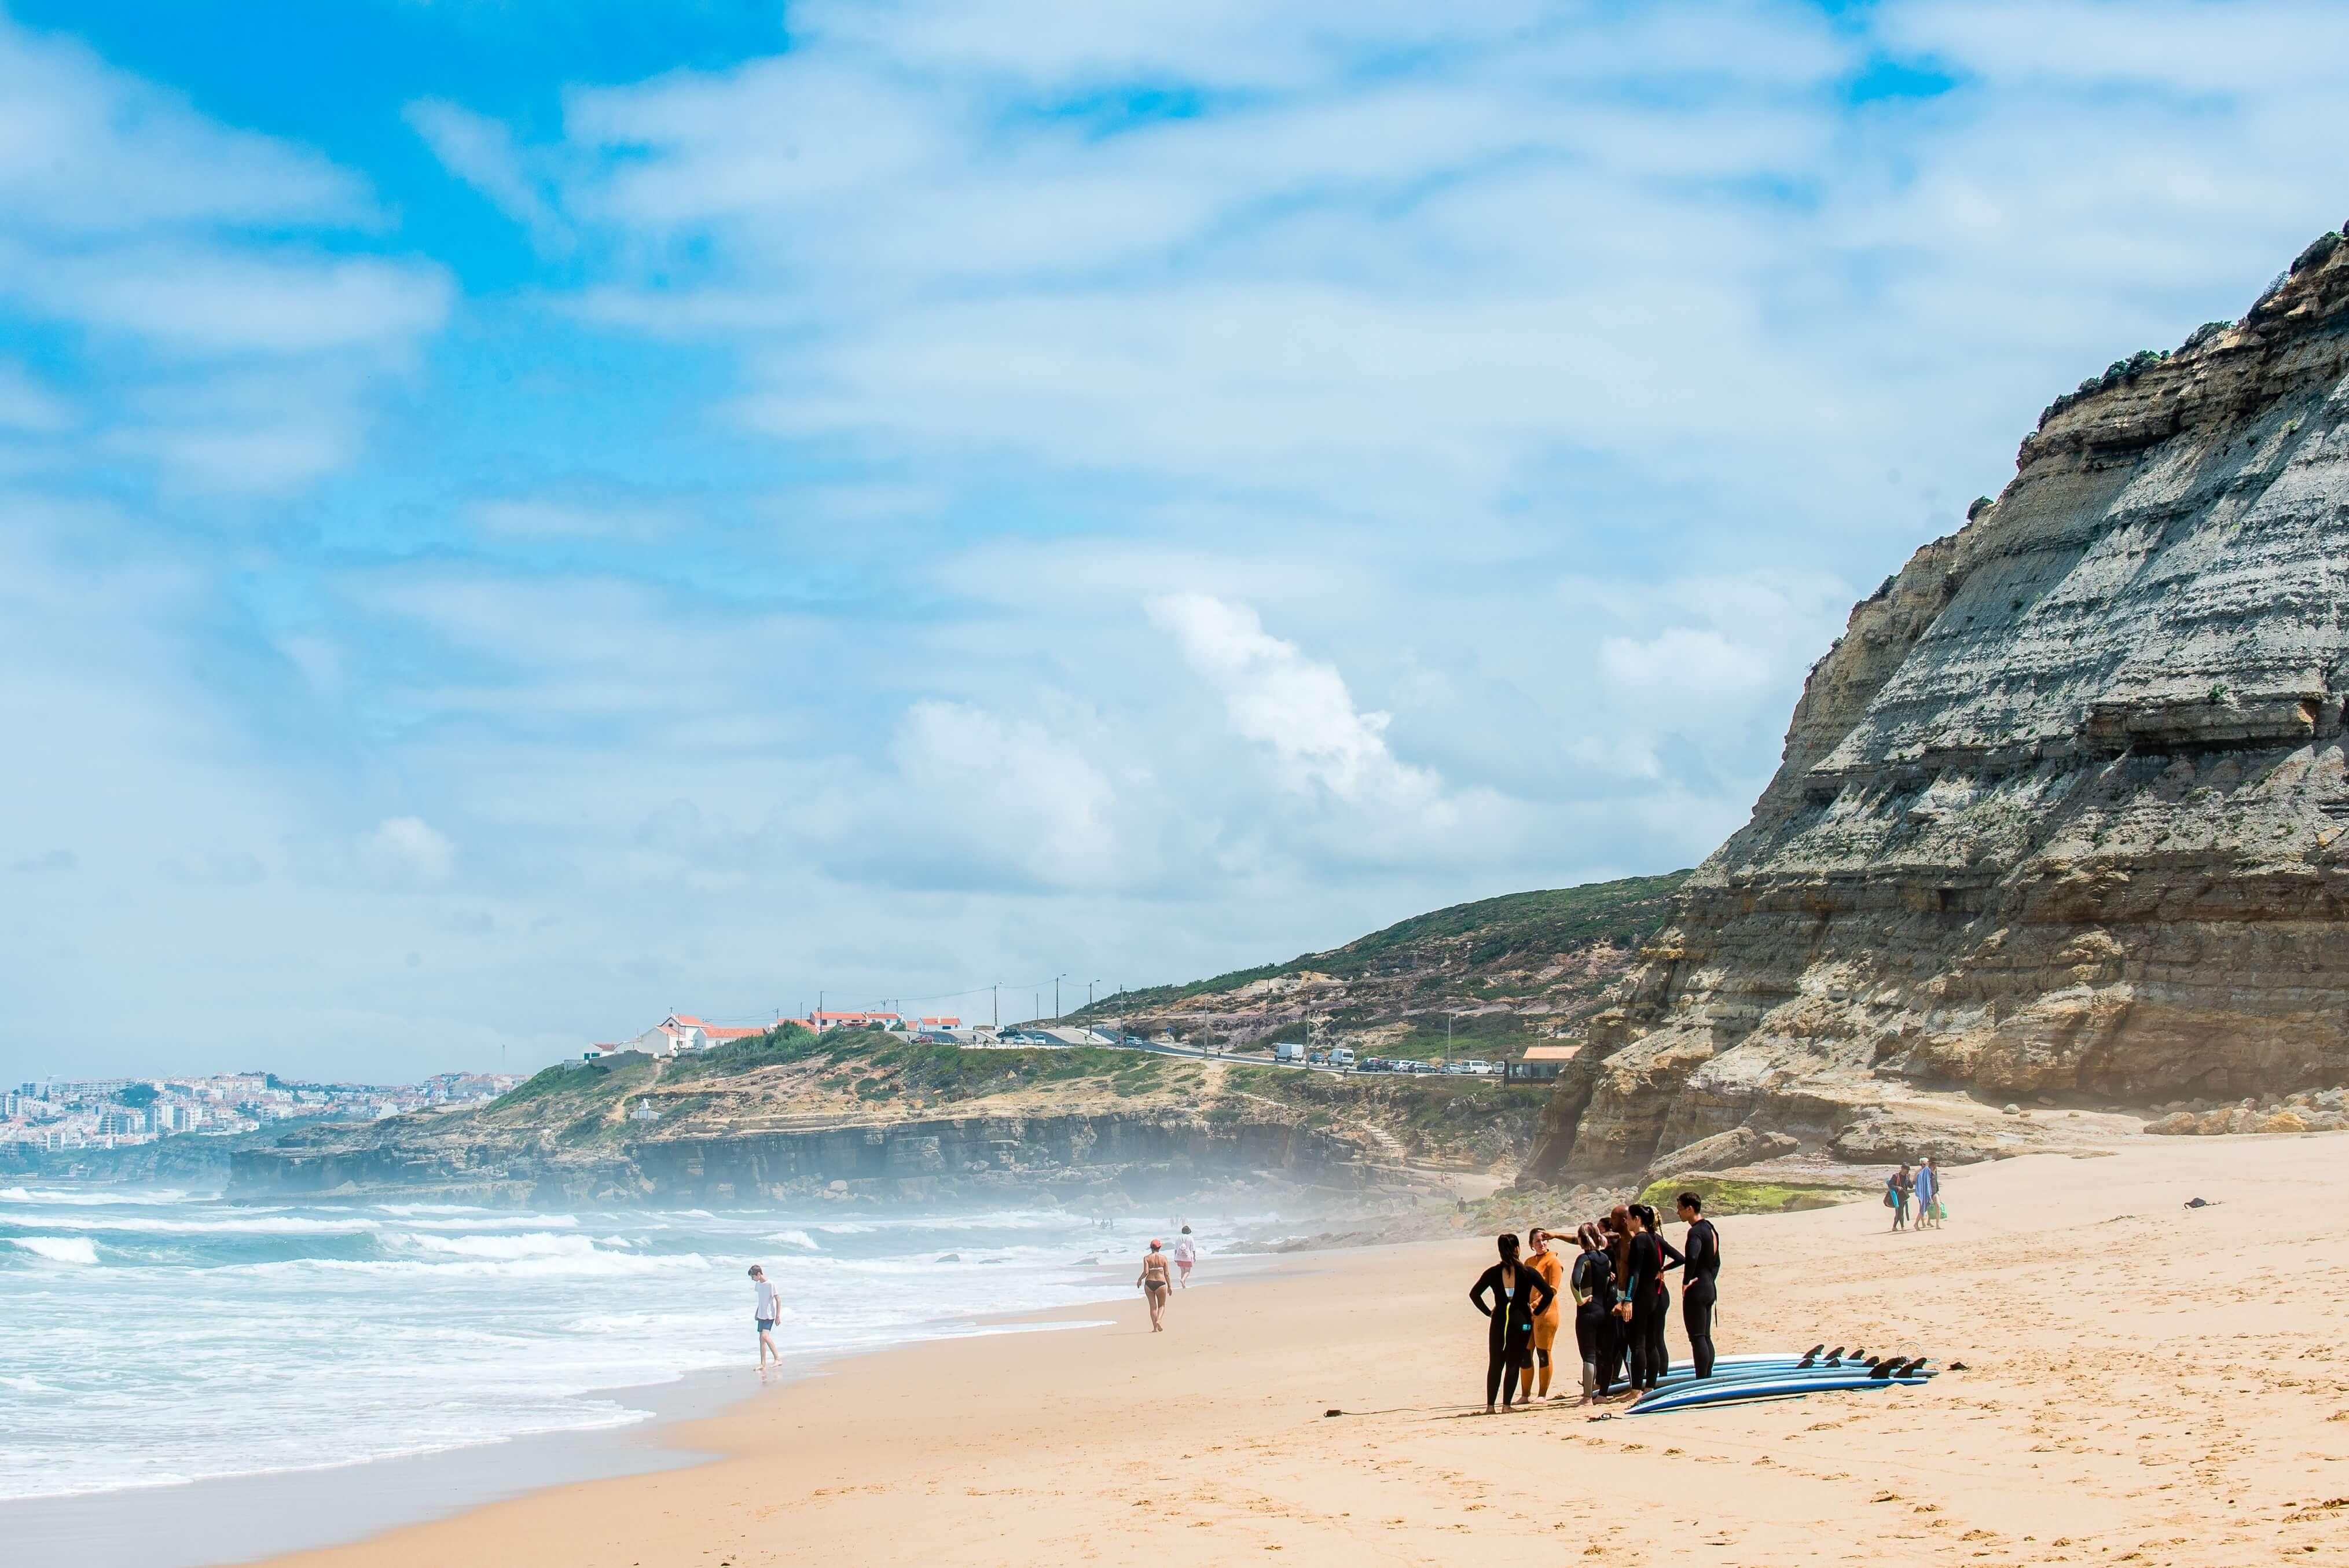 Surfcamp SELINA SURF CLUB BOAVISTA ERICEIRA in Ericeira, Lisbon, Portugal